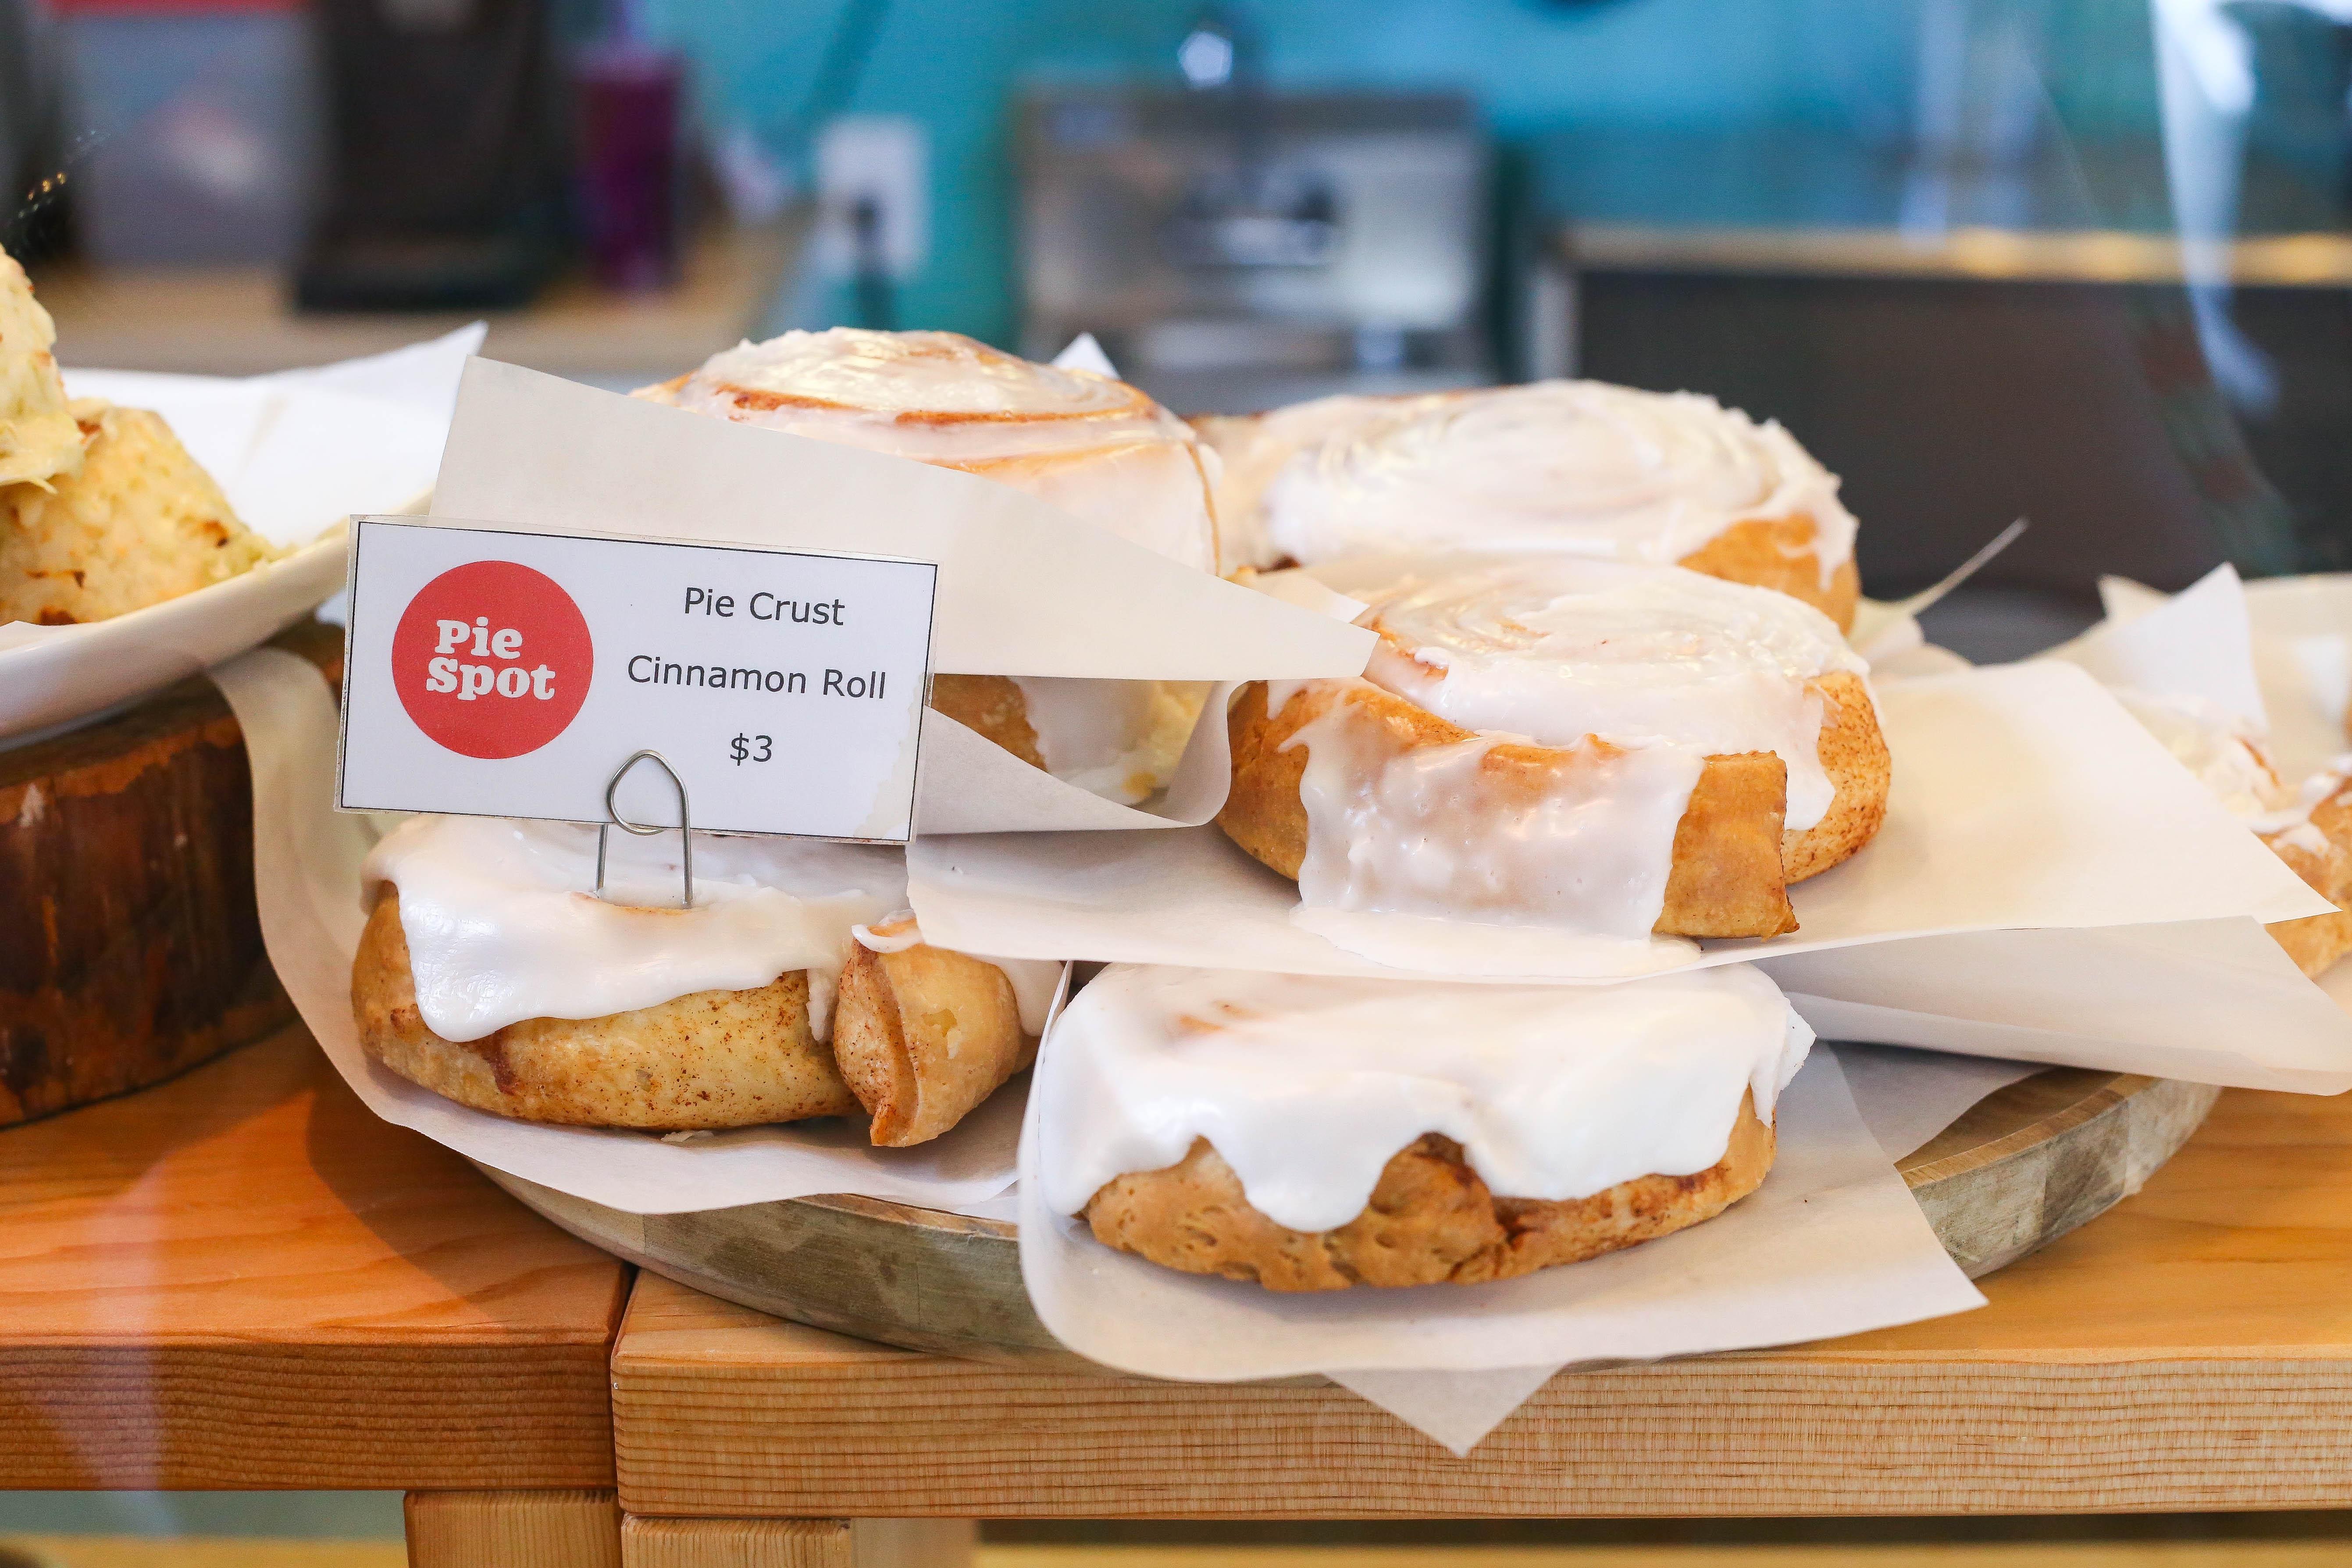 portlant-dessert-pie-spot-cinnamon-roll